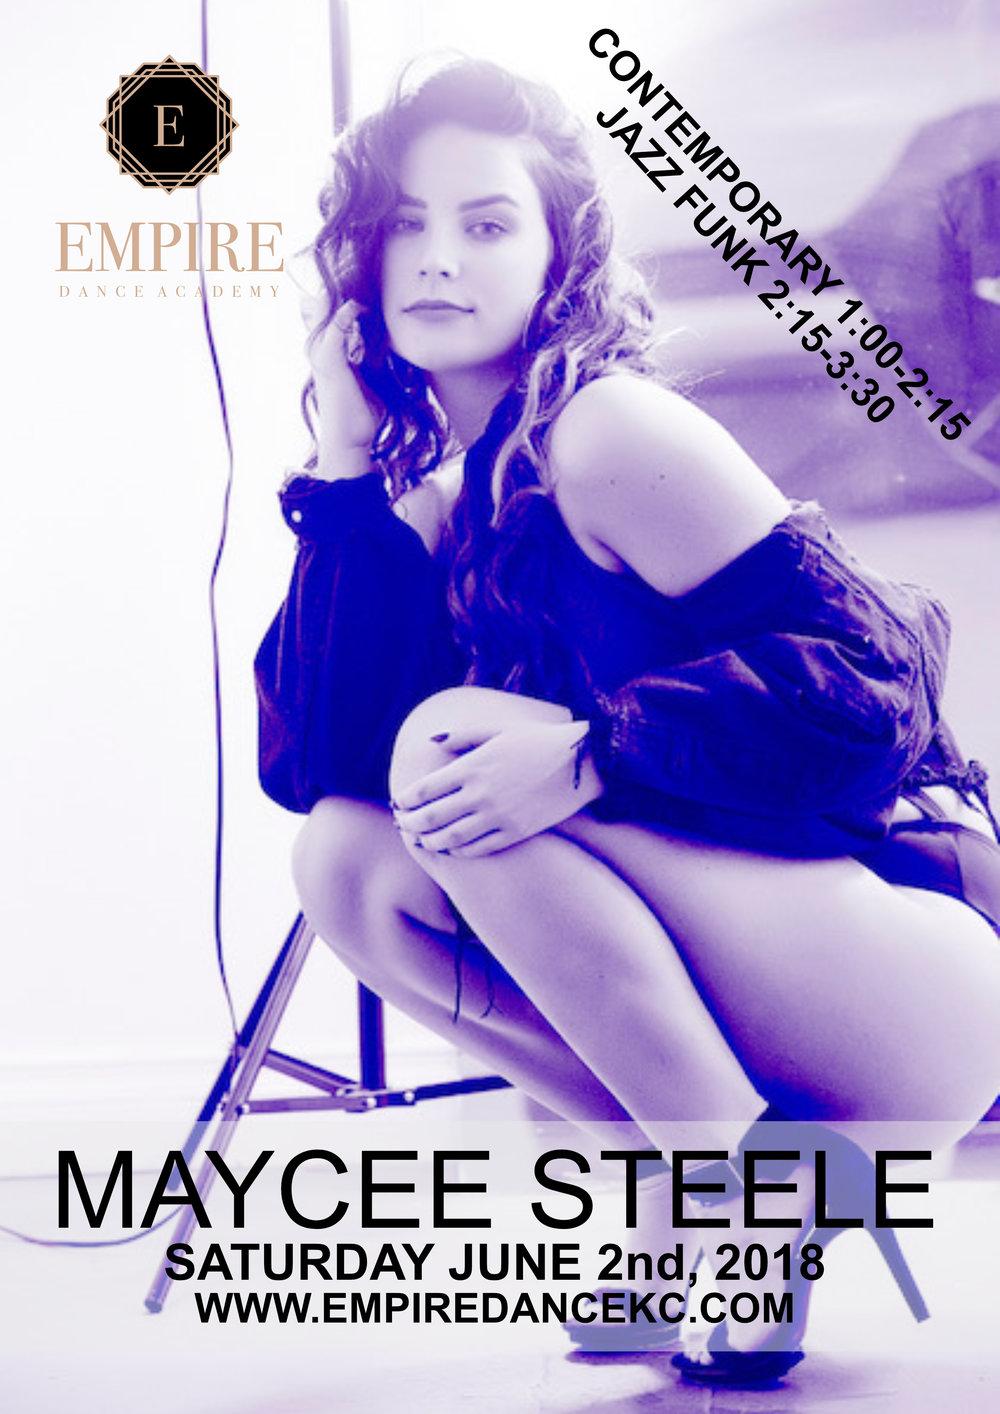 MAYCEE STEELE 3.jpg